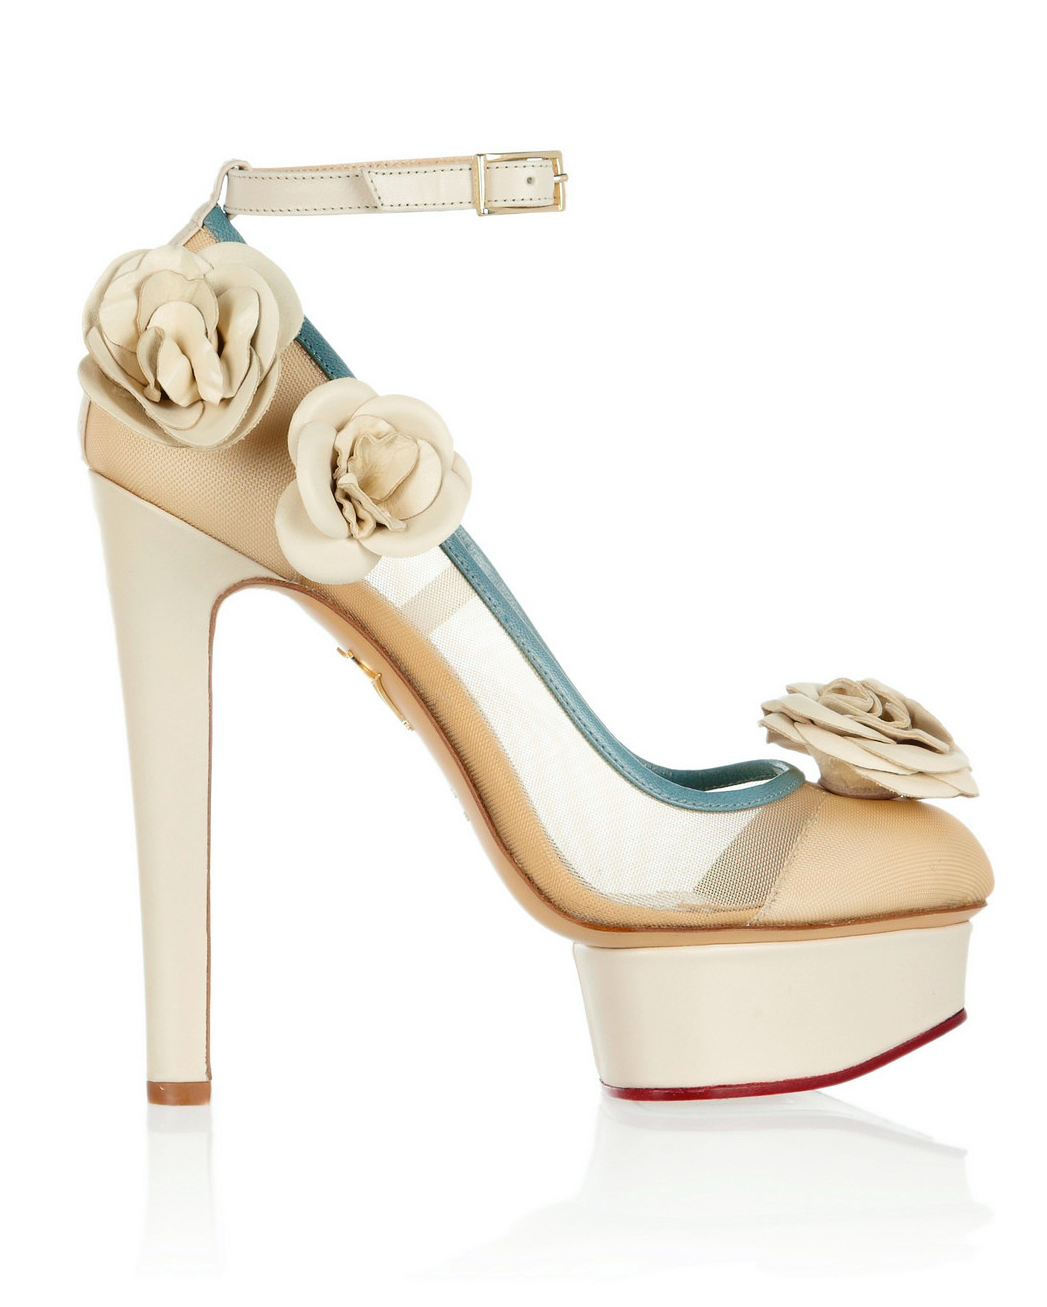 mesh-wedding-shoes-charlotte-olympia-flora-0315.jpg